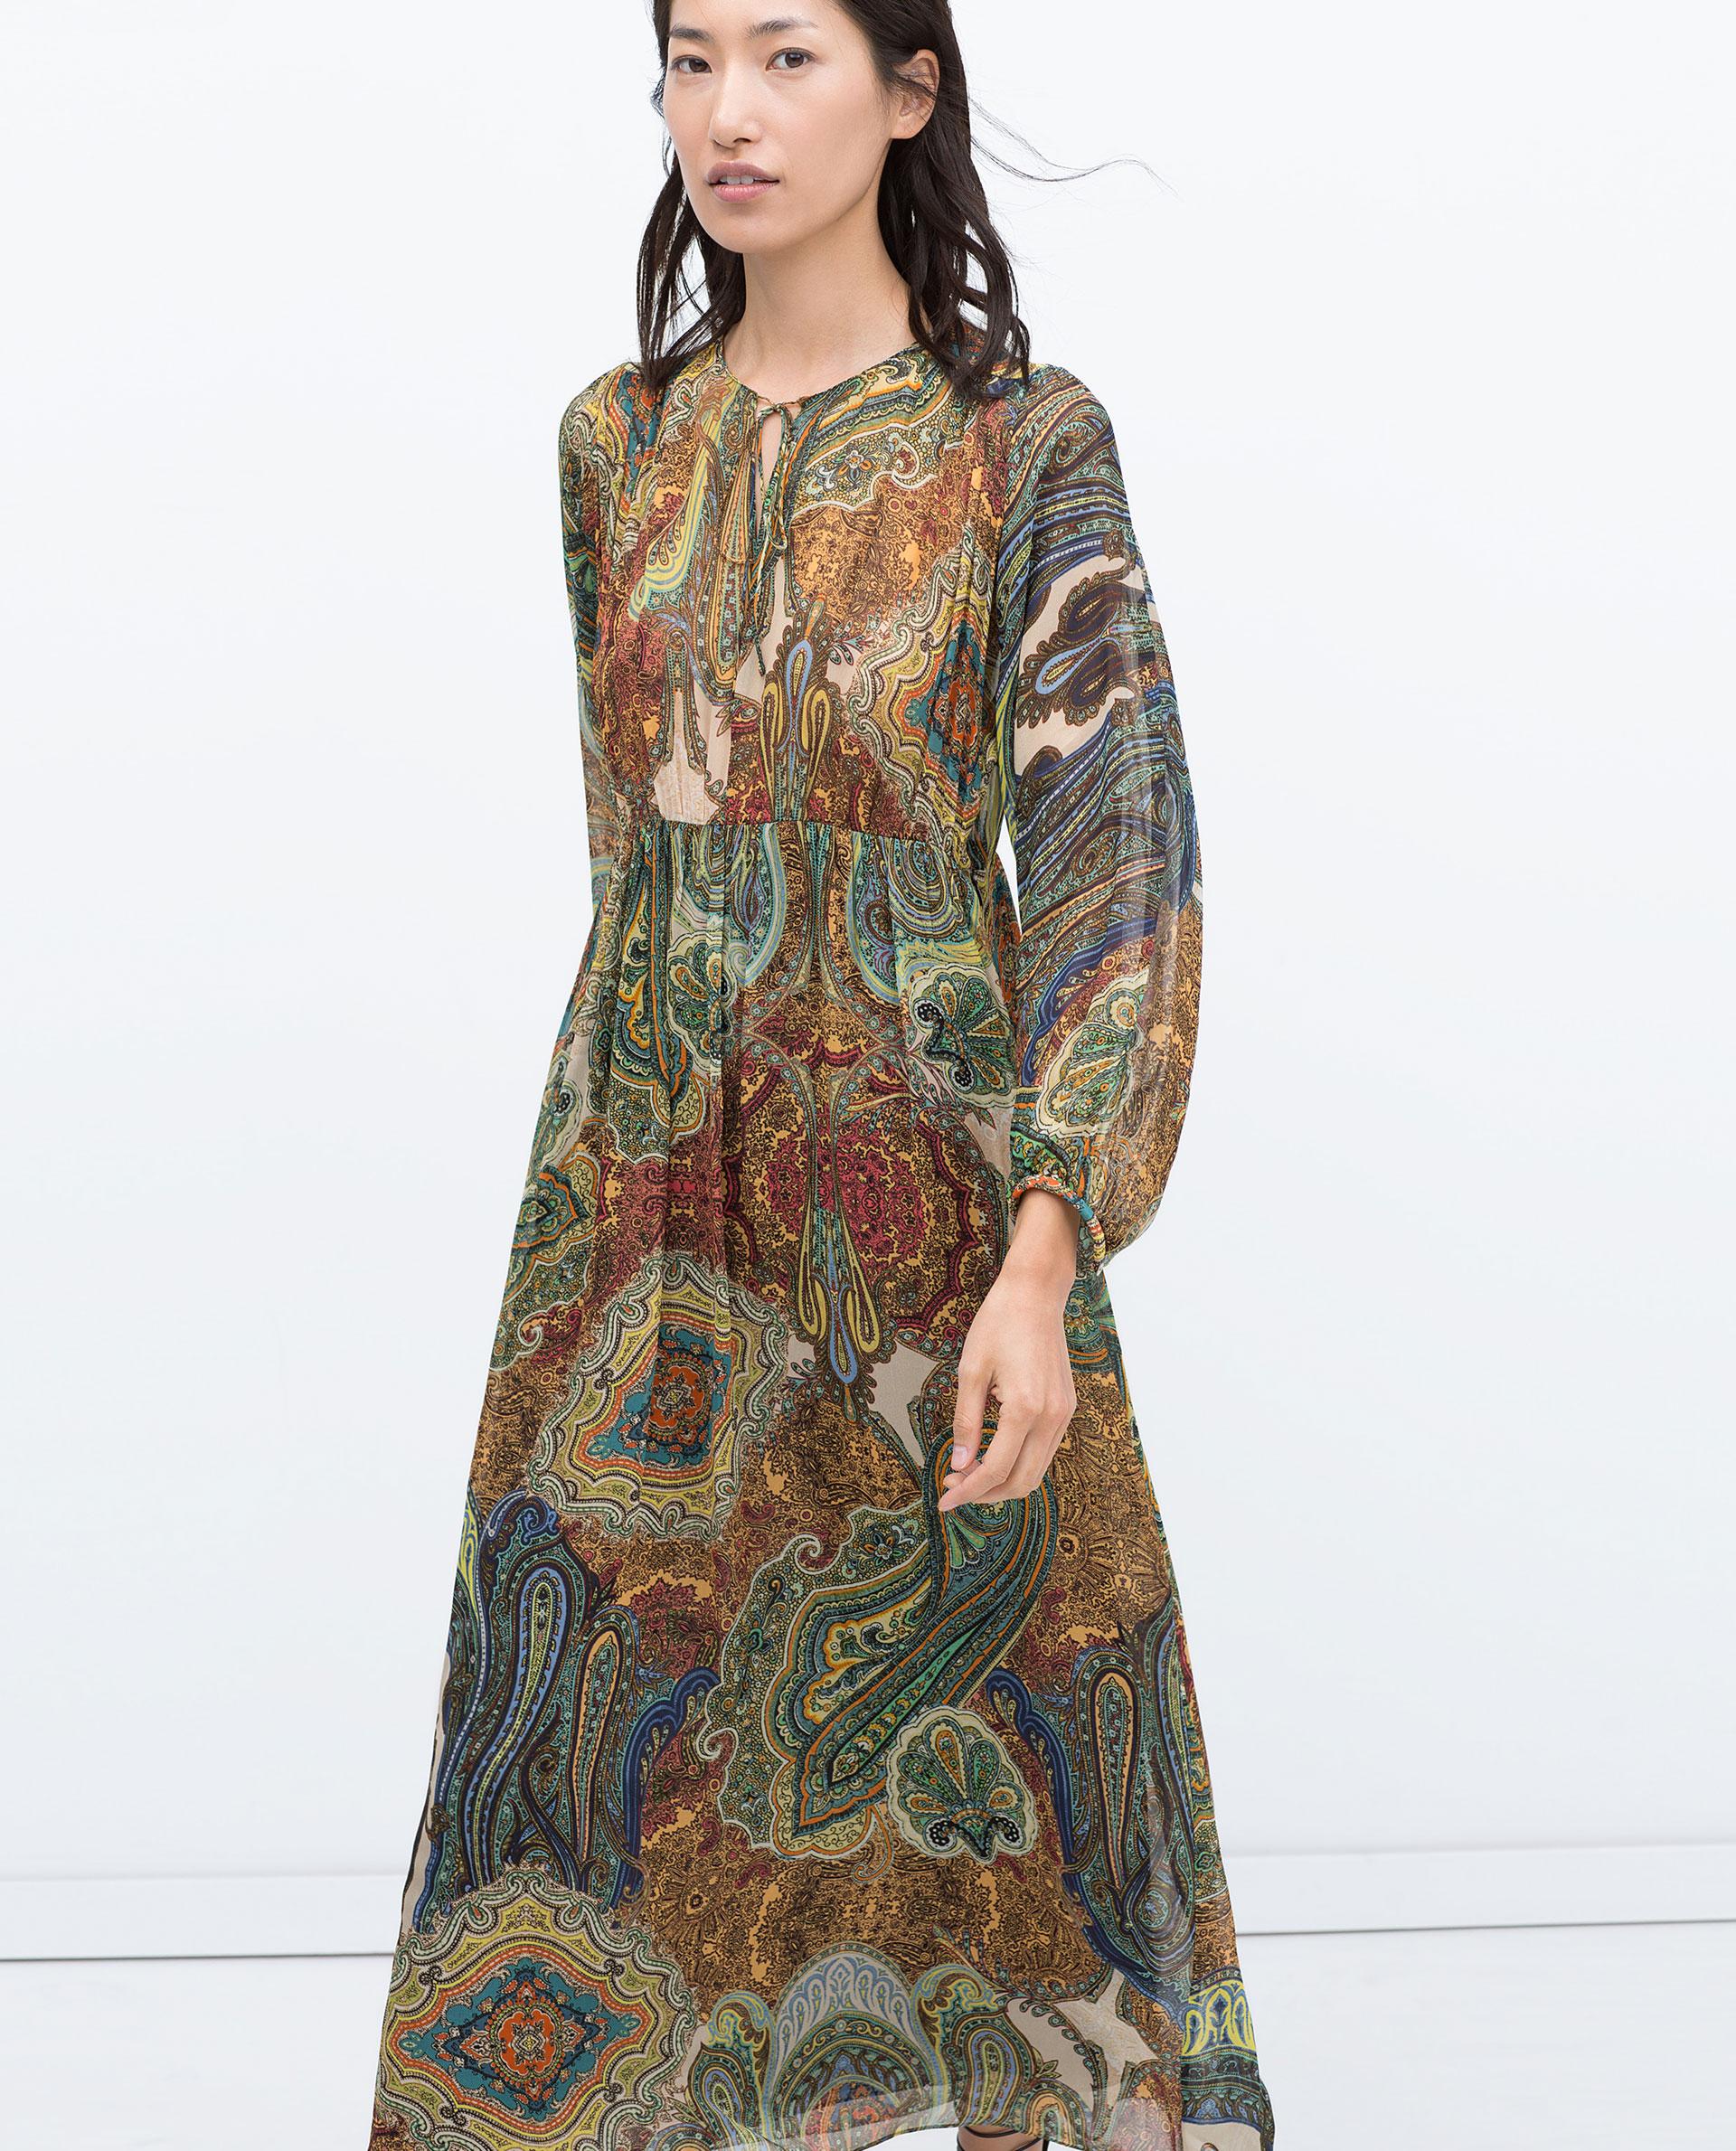 Zara Oriental Floral Print Dress